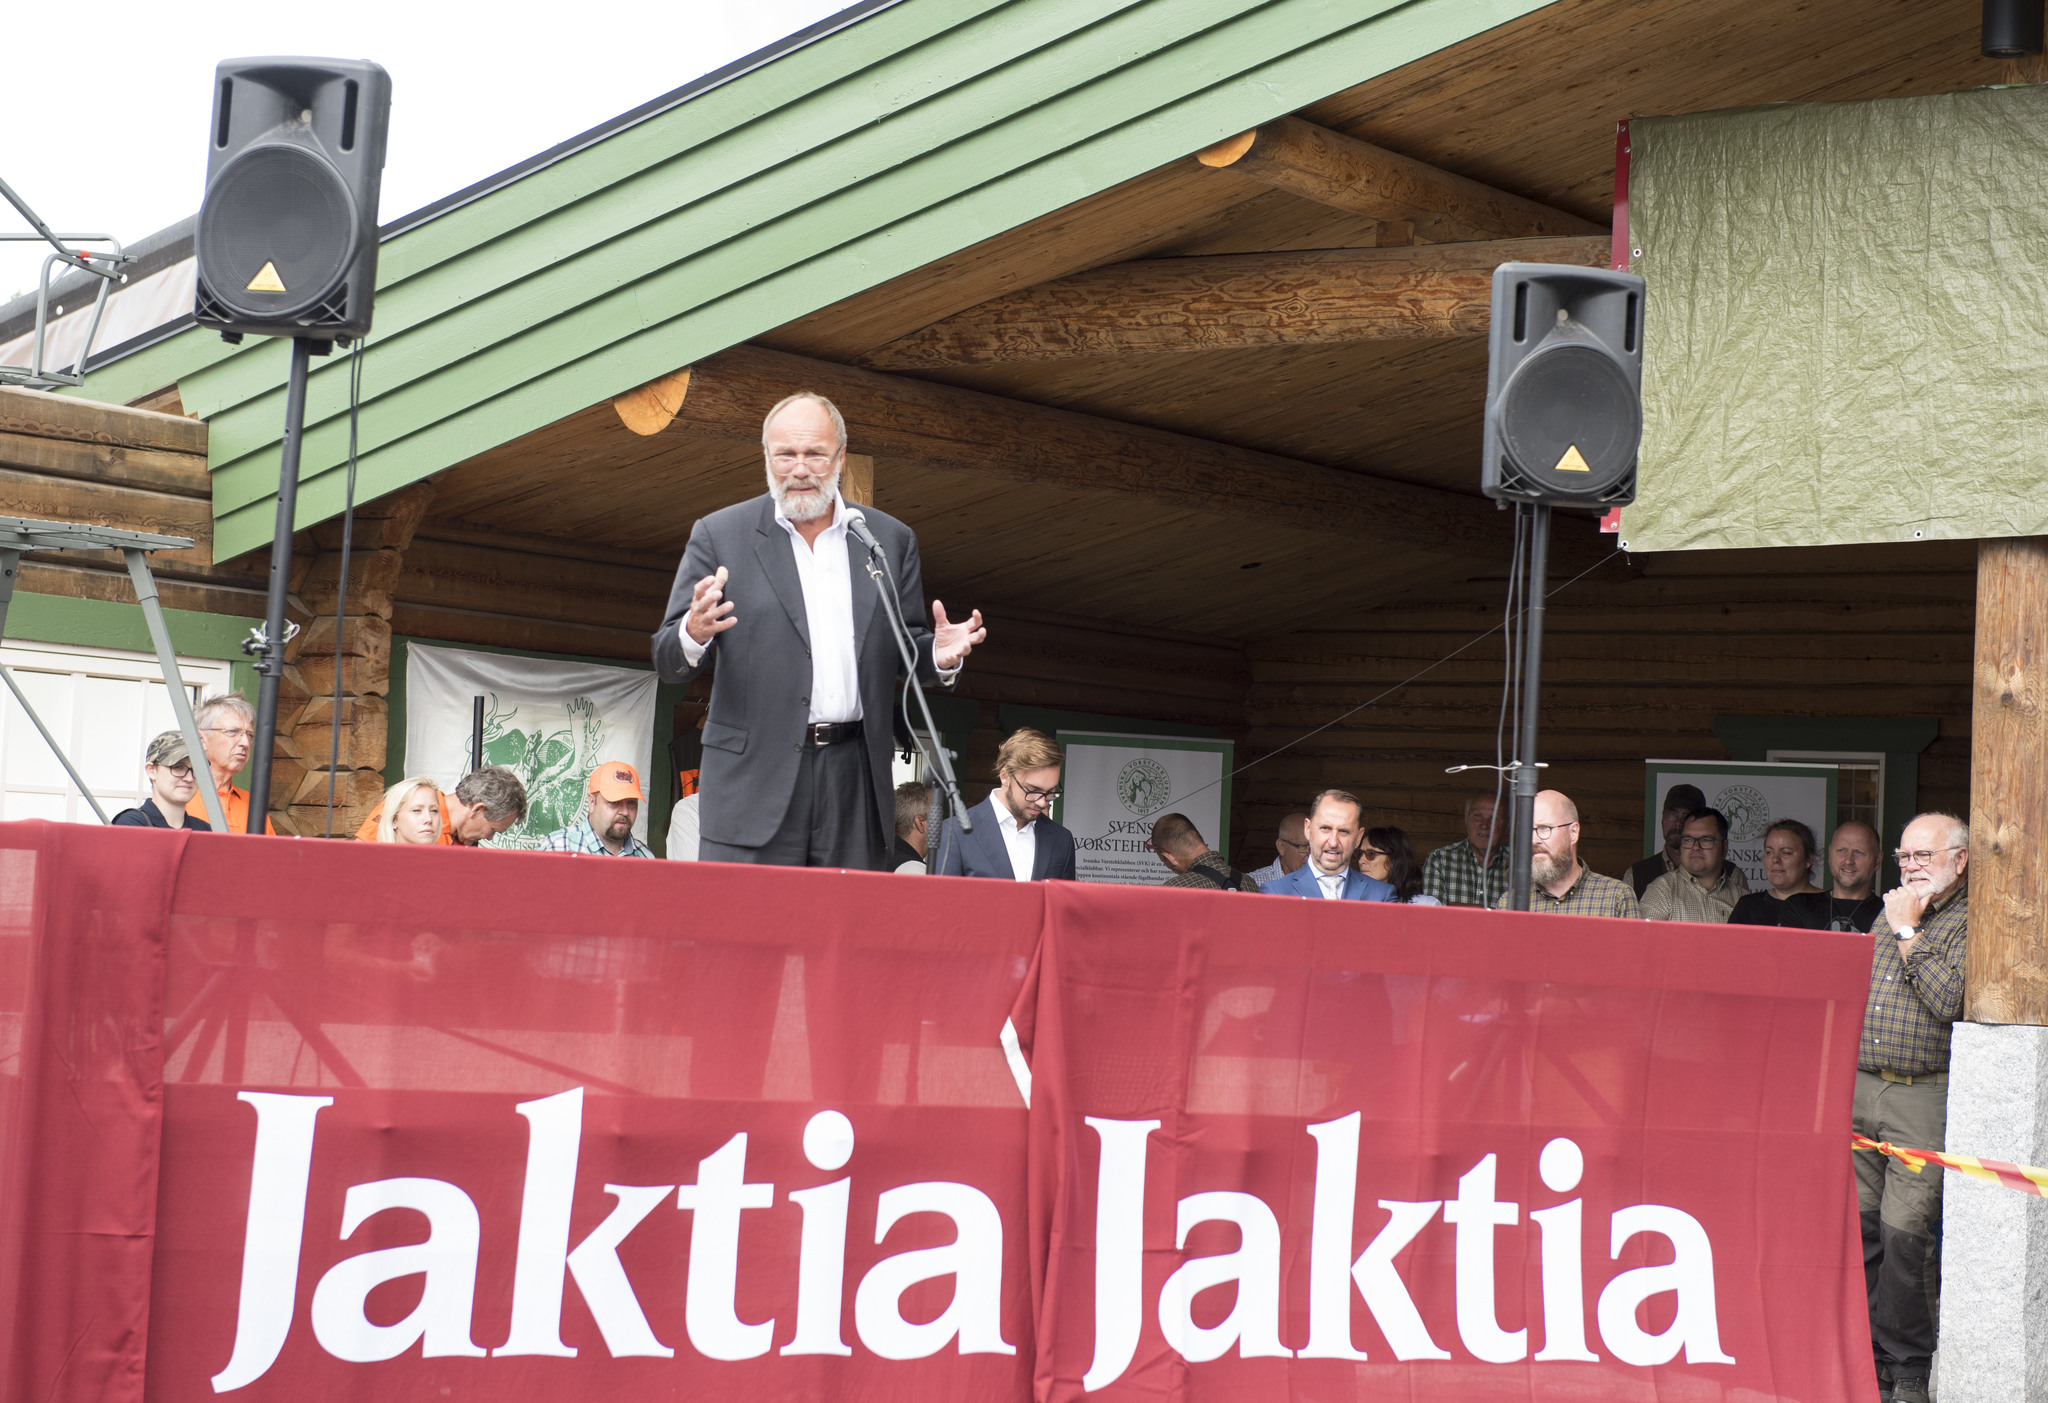 Stort intresse for det svenska systemet